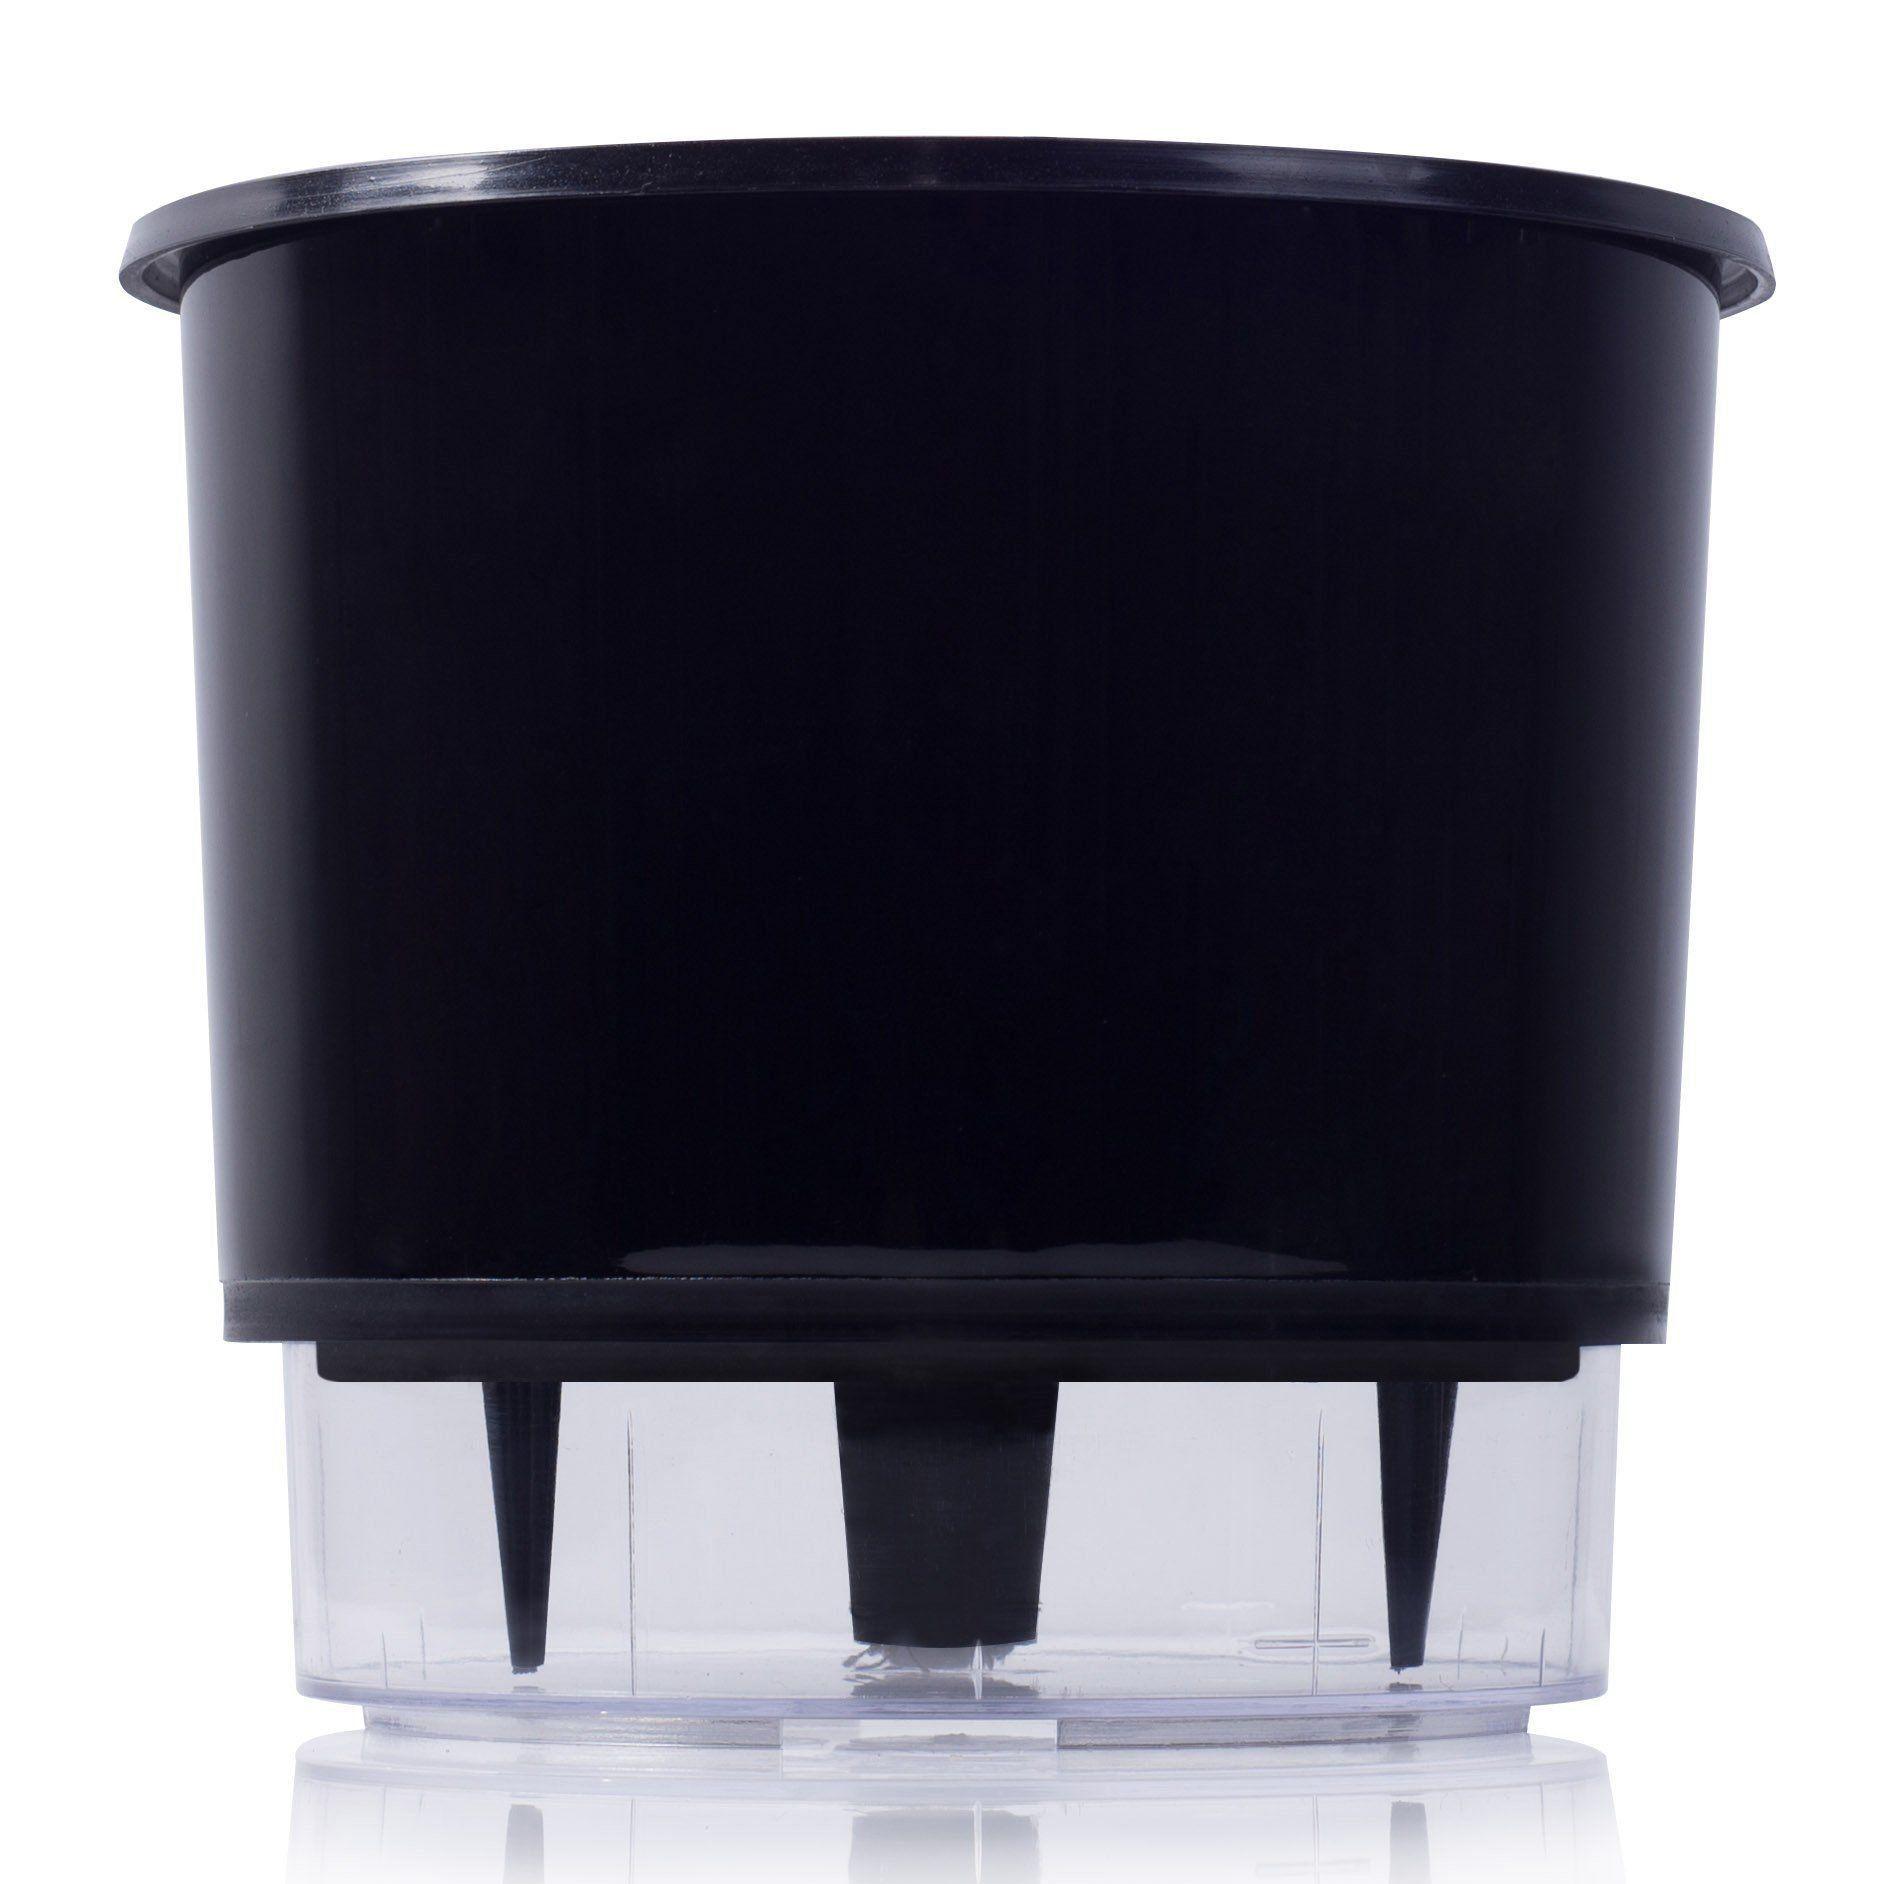 Vaso autoirrigável Raiz PEQUENO N02 12 cm X 11 cm